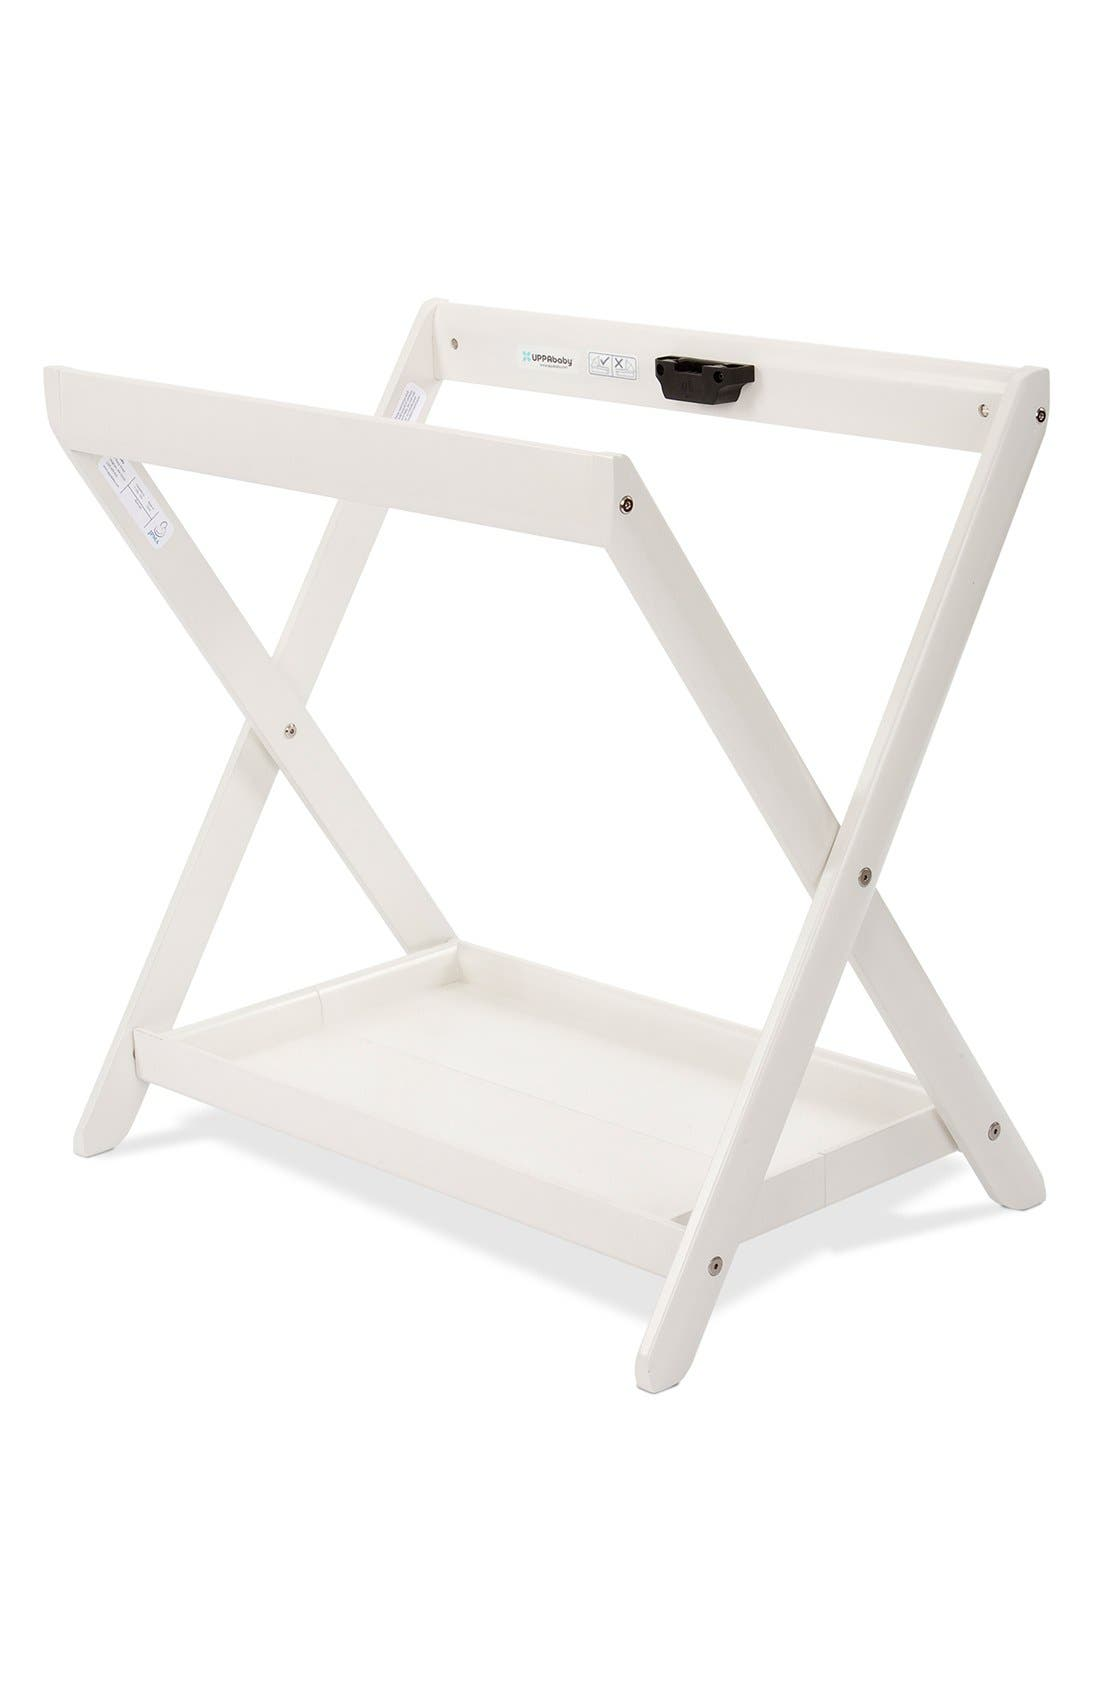 Main Image - UPPAbaby VISTA Bassinet Stand